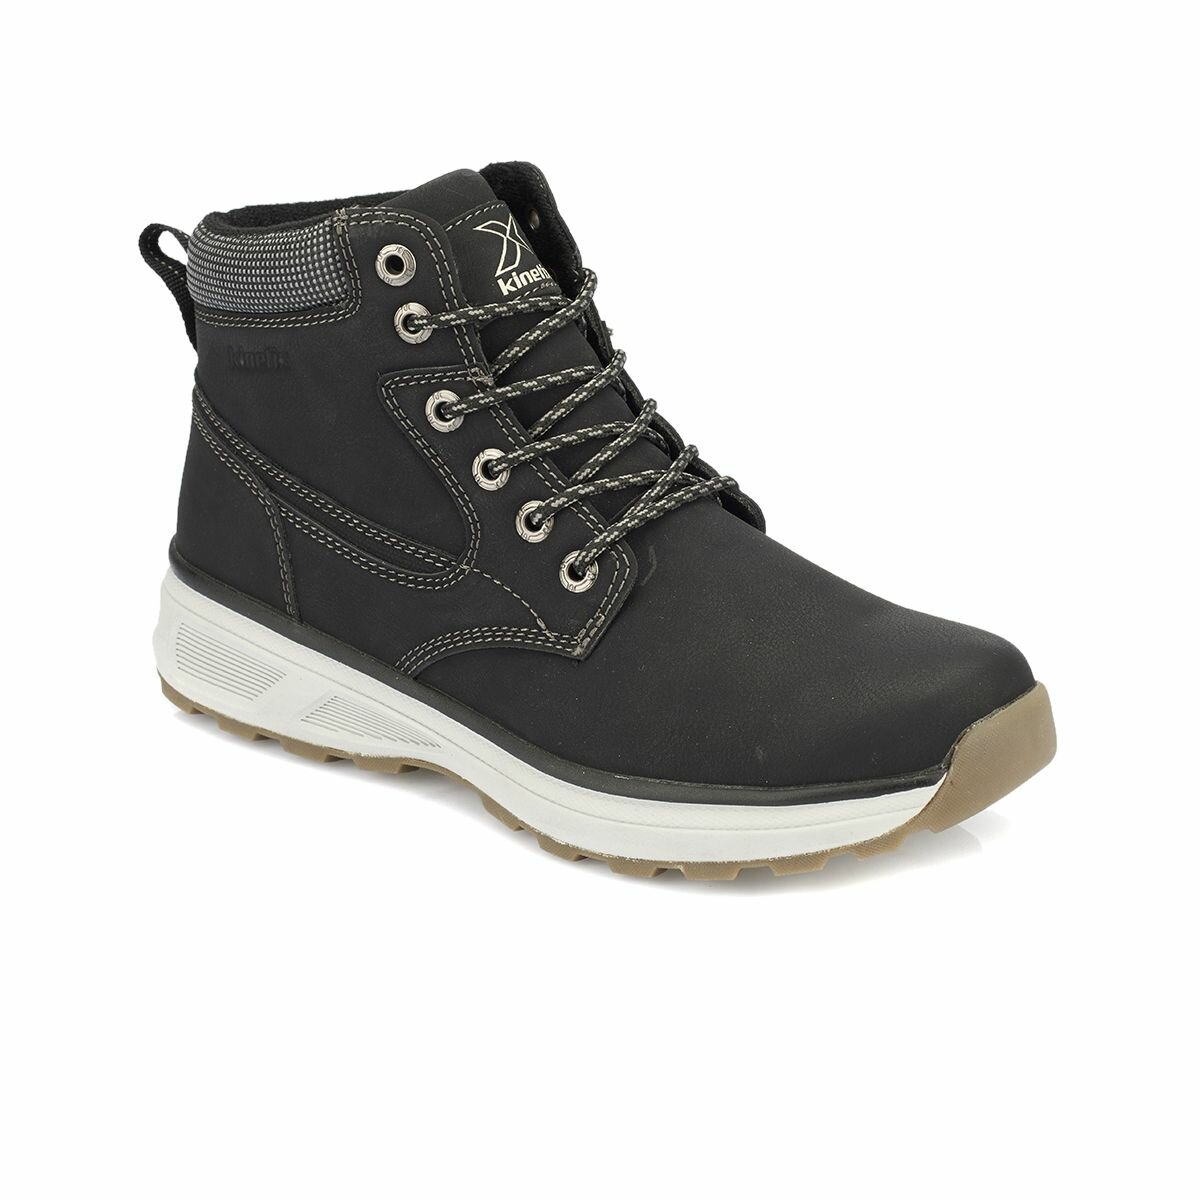 FLO CAMERON Black Men Boots KINETIX